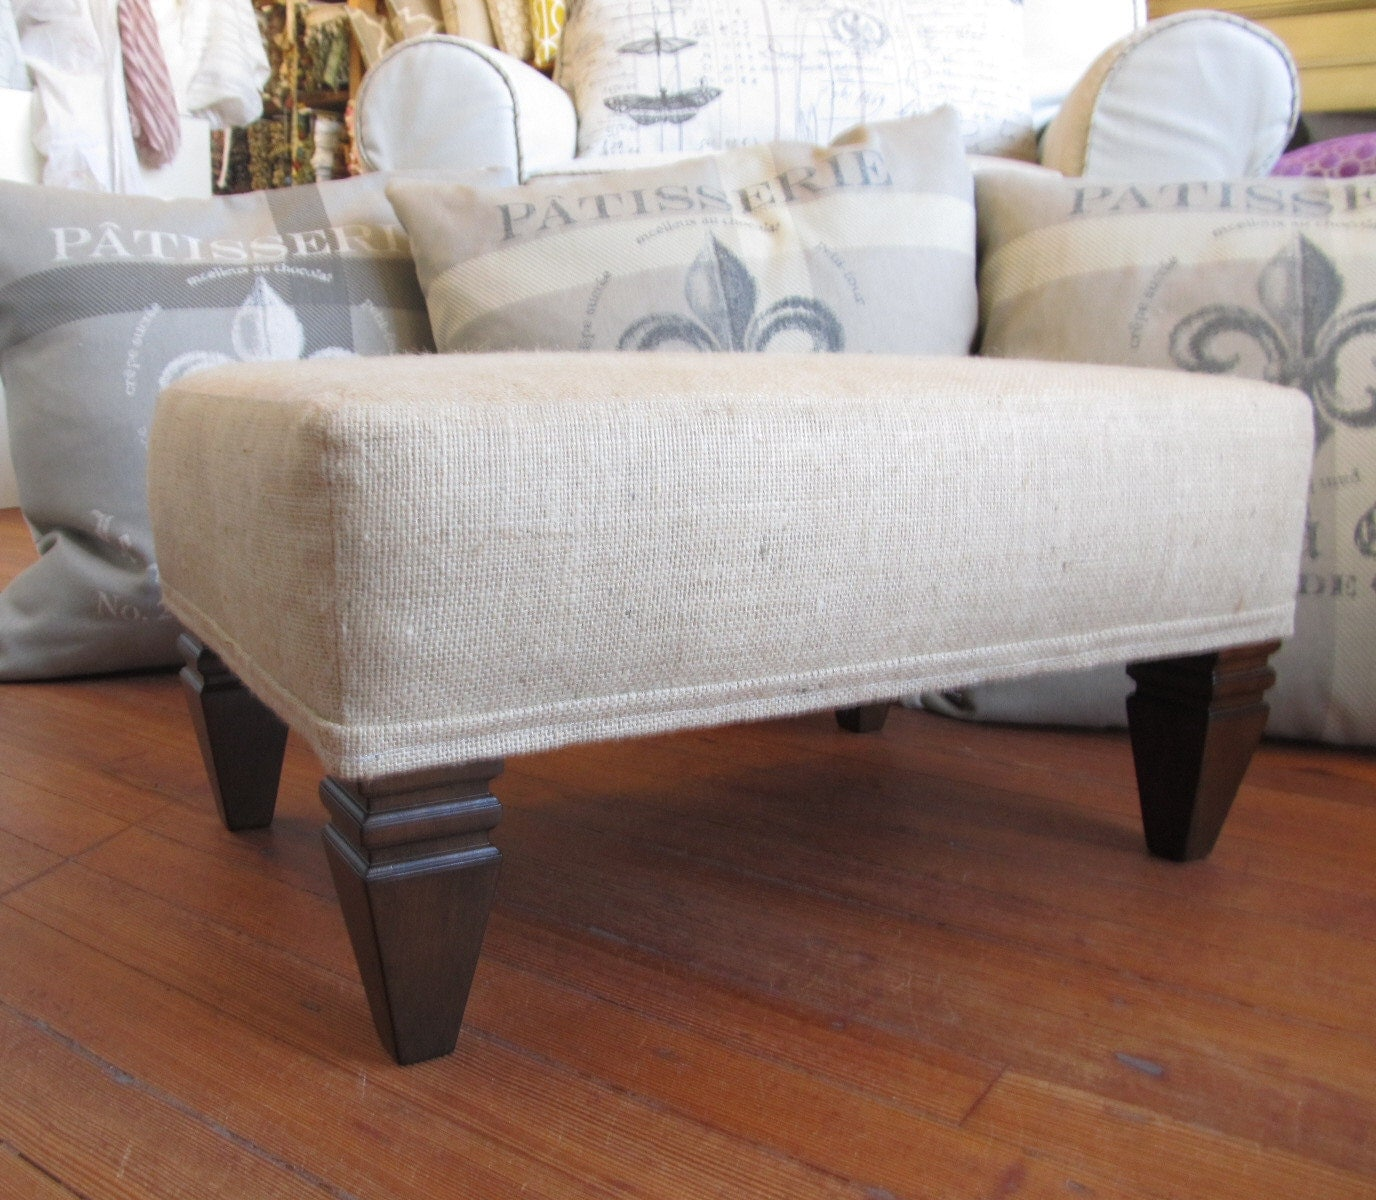 ottoman footstool coffee table burlap furniture. Black Bedroom Furniture Sets. Home Design Ideas